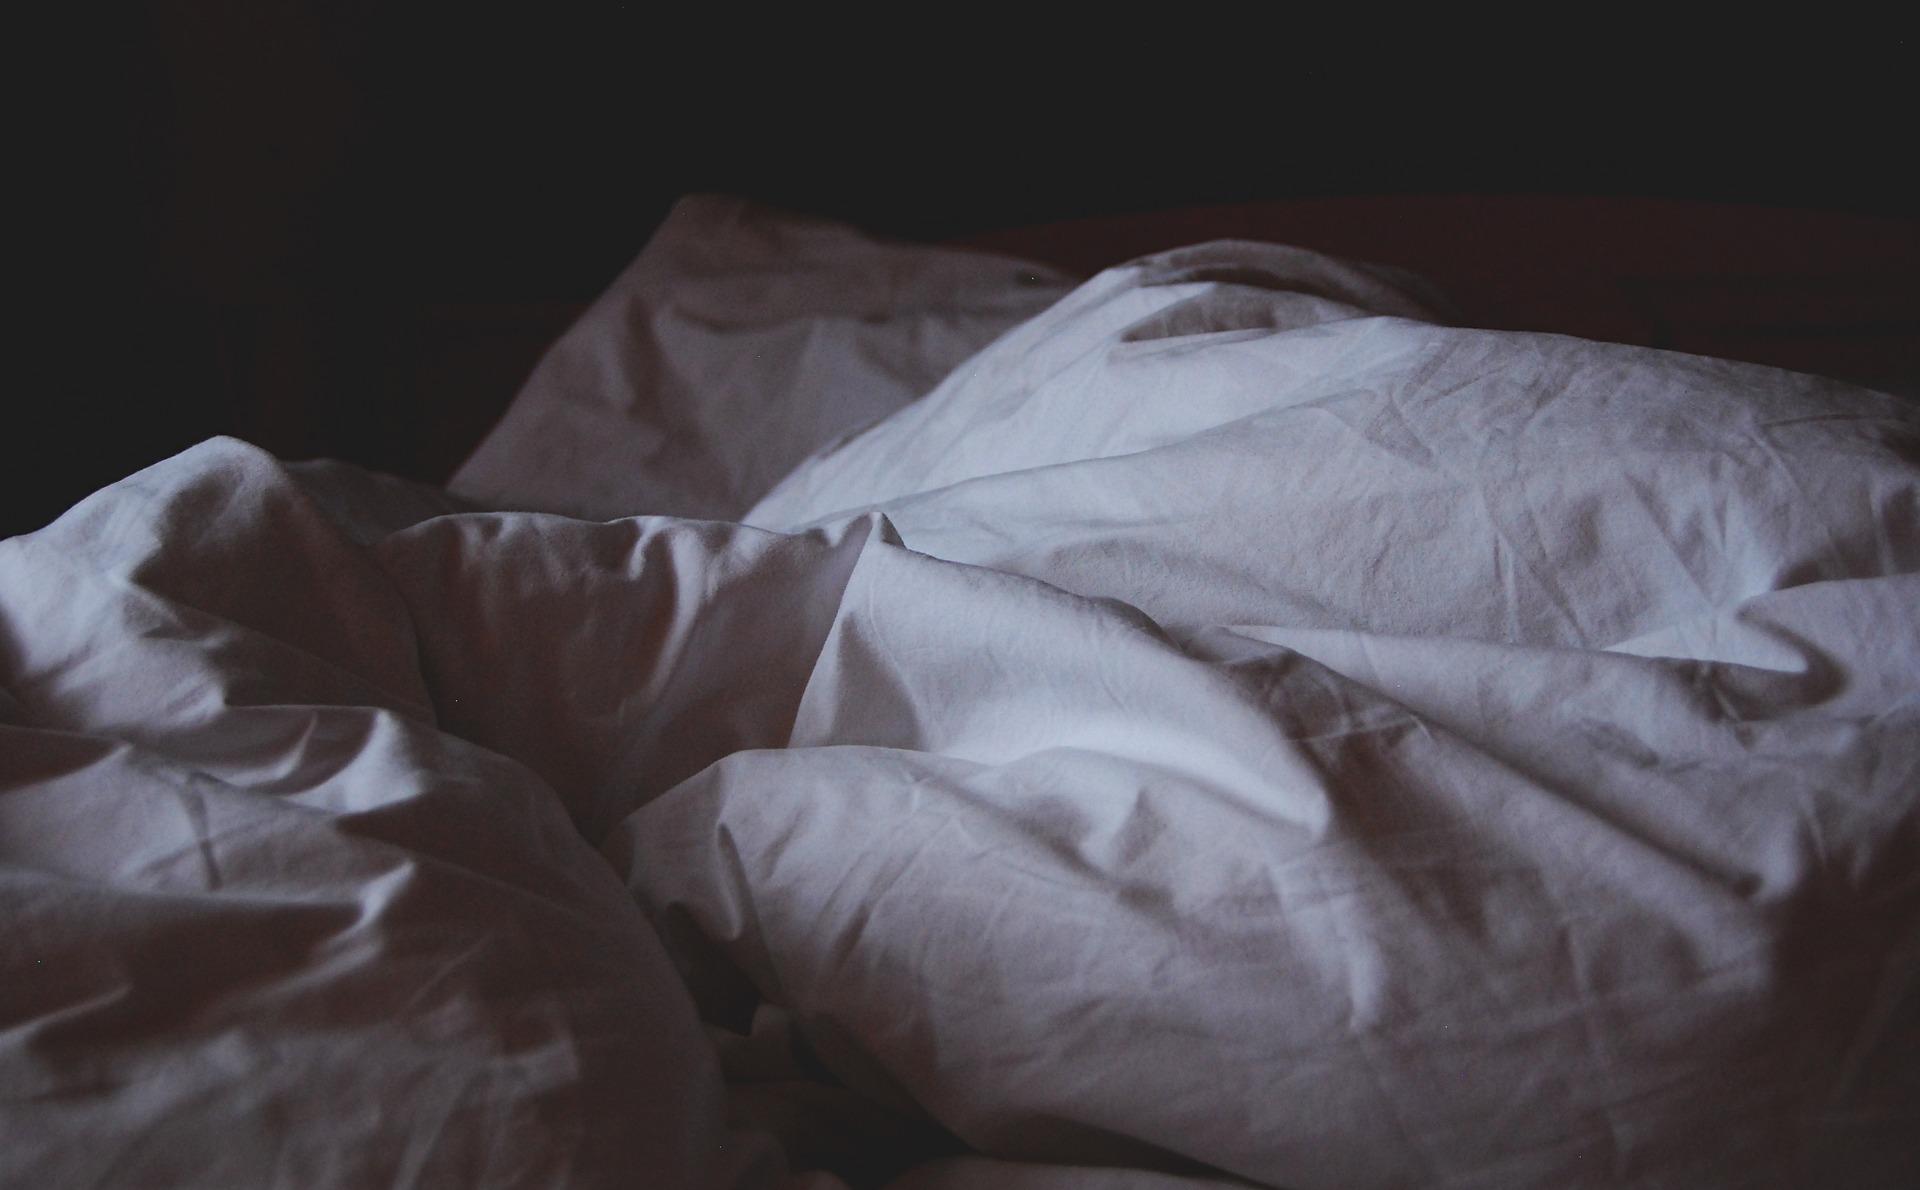 Ruffled sheets on bed - Bondage Bunnies